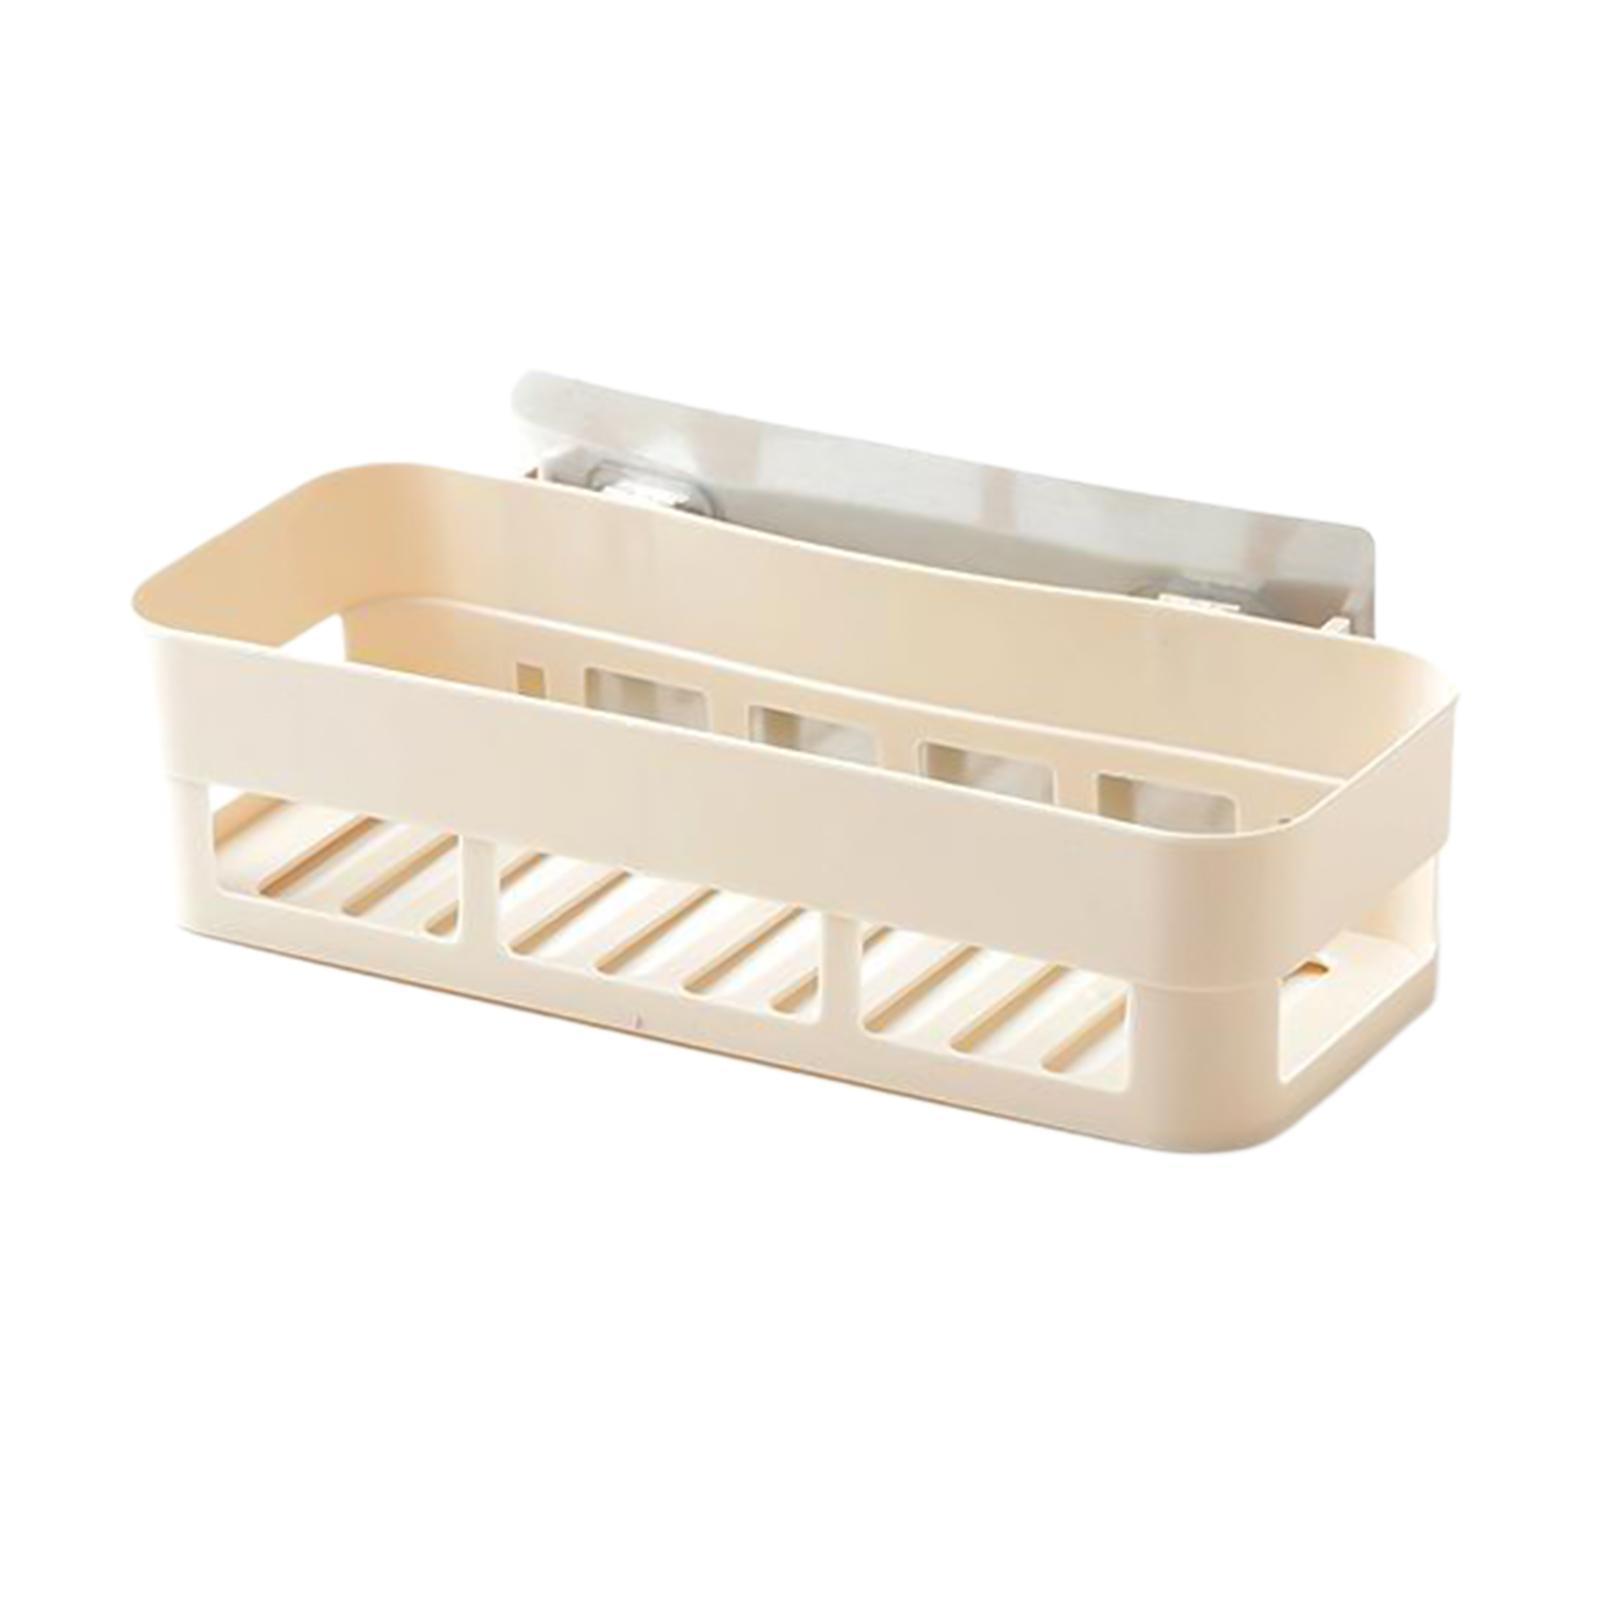 thumbnail 24 - Wall-Suction-Bathroom-Shelf-Shower-Caddy-Wall-Mount-Storage-Rack-Organizer